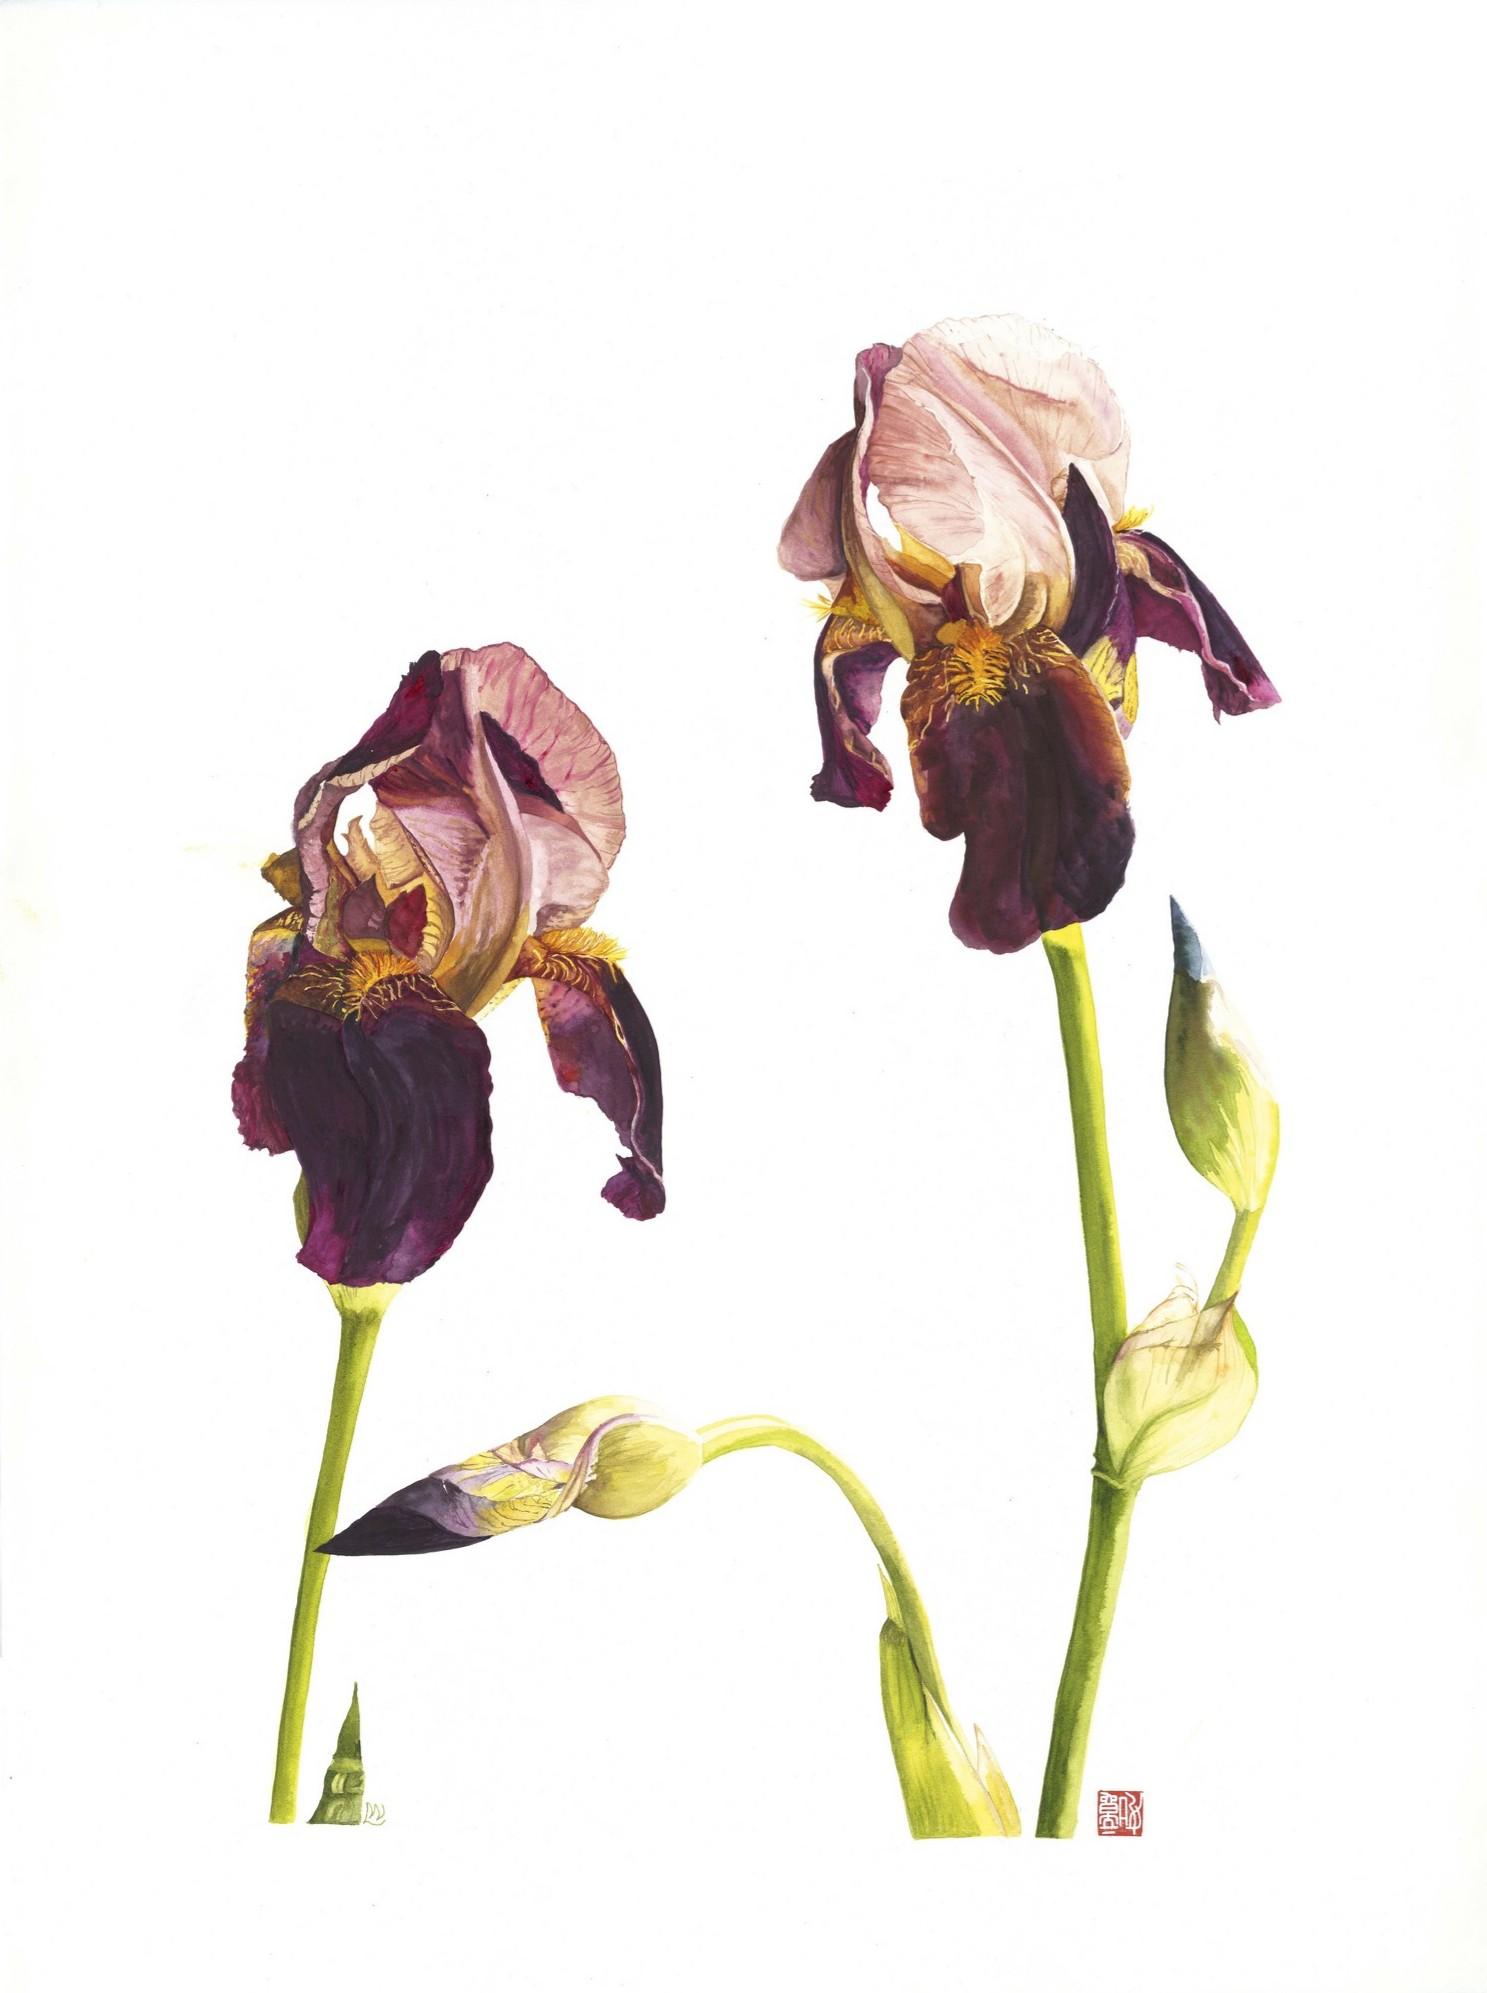 Iris with Bud, 2013